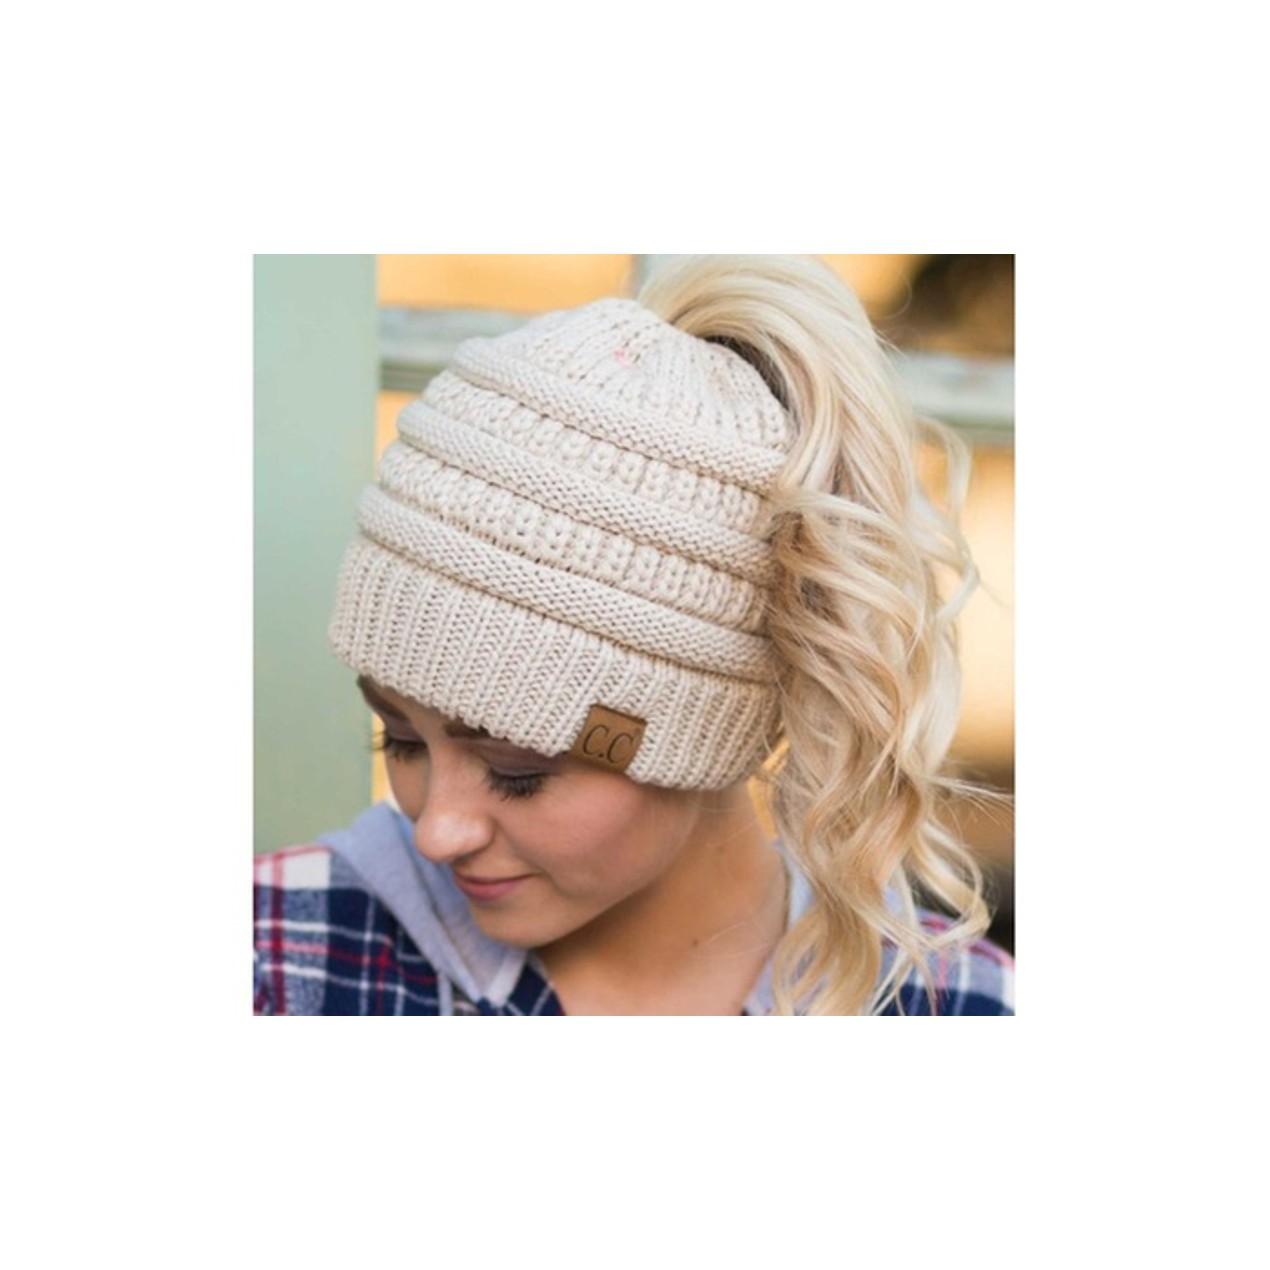 4c7d325fa80 C.C. Cable Knit Ponytail Beanie (7 Colors) - Tanga